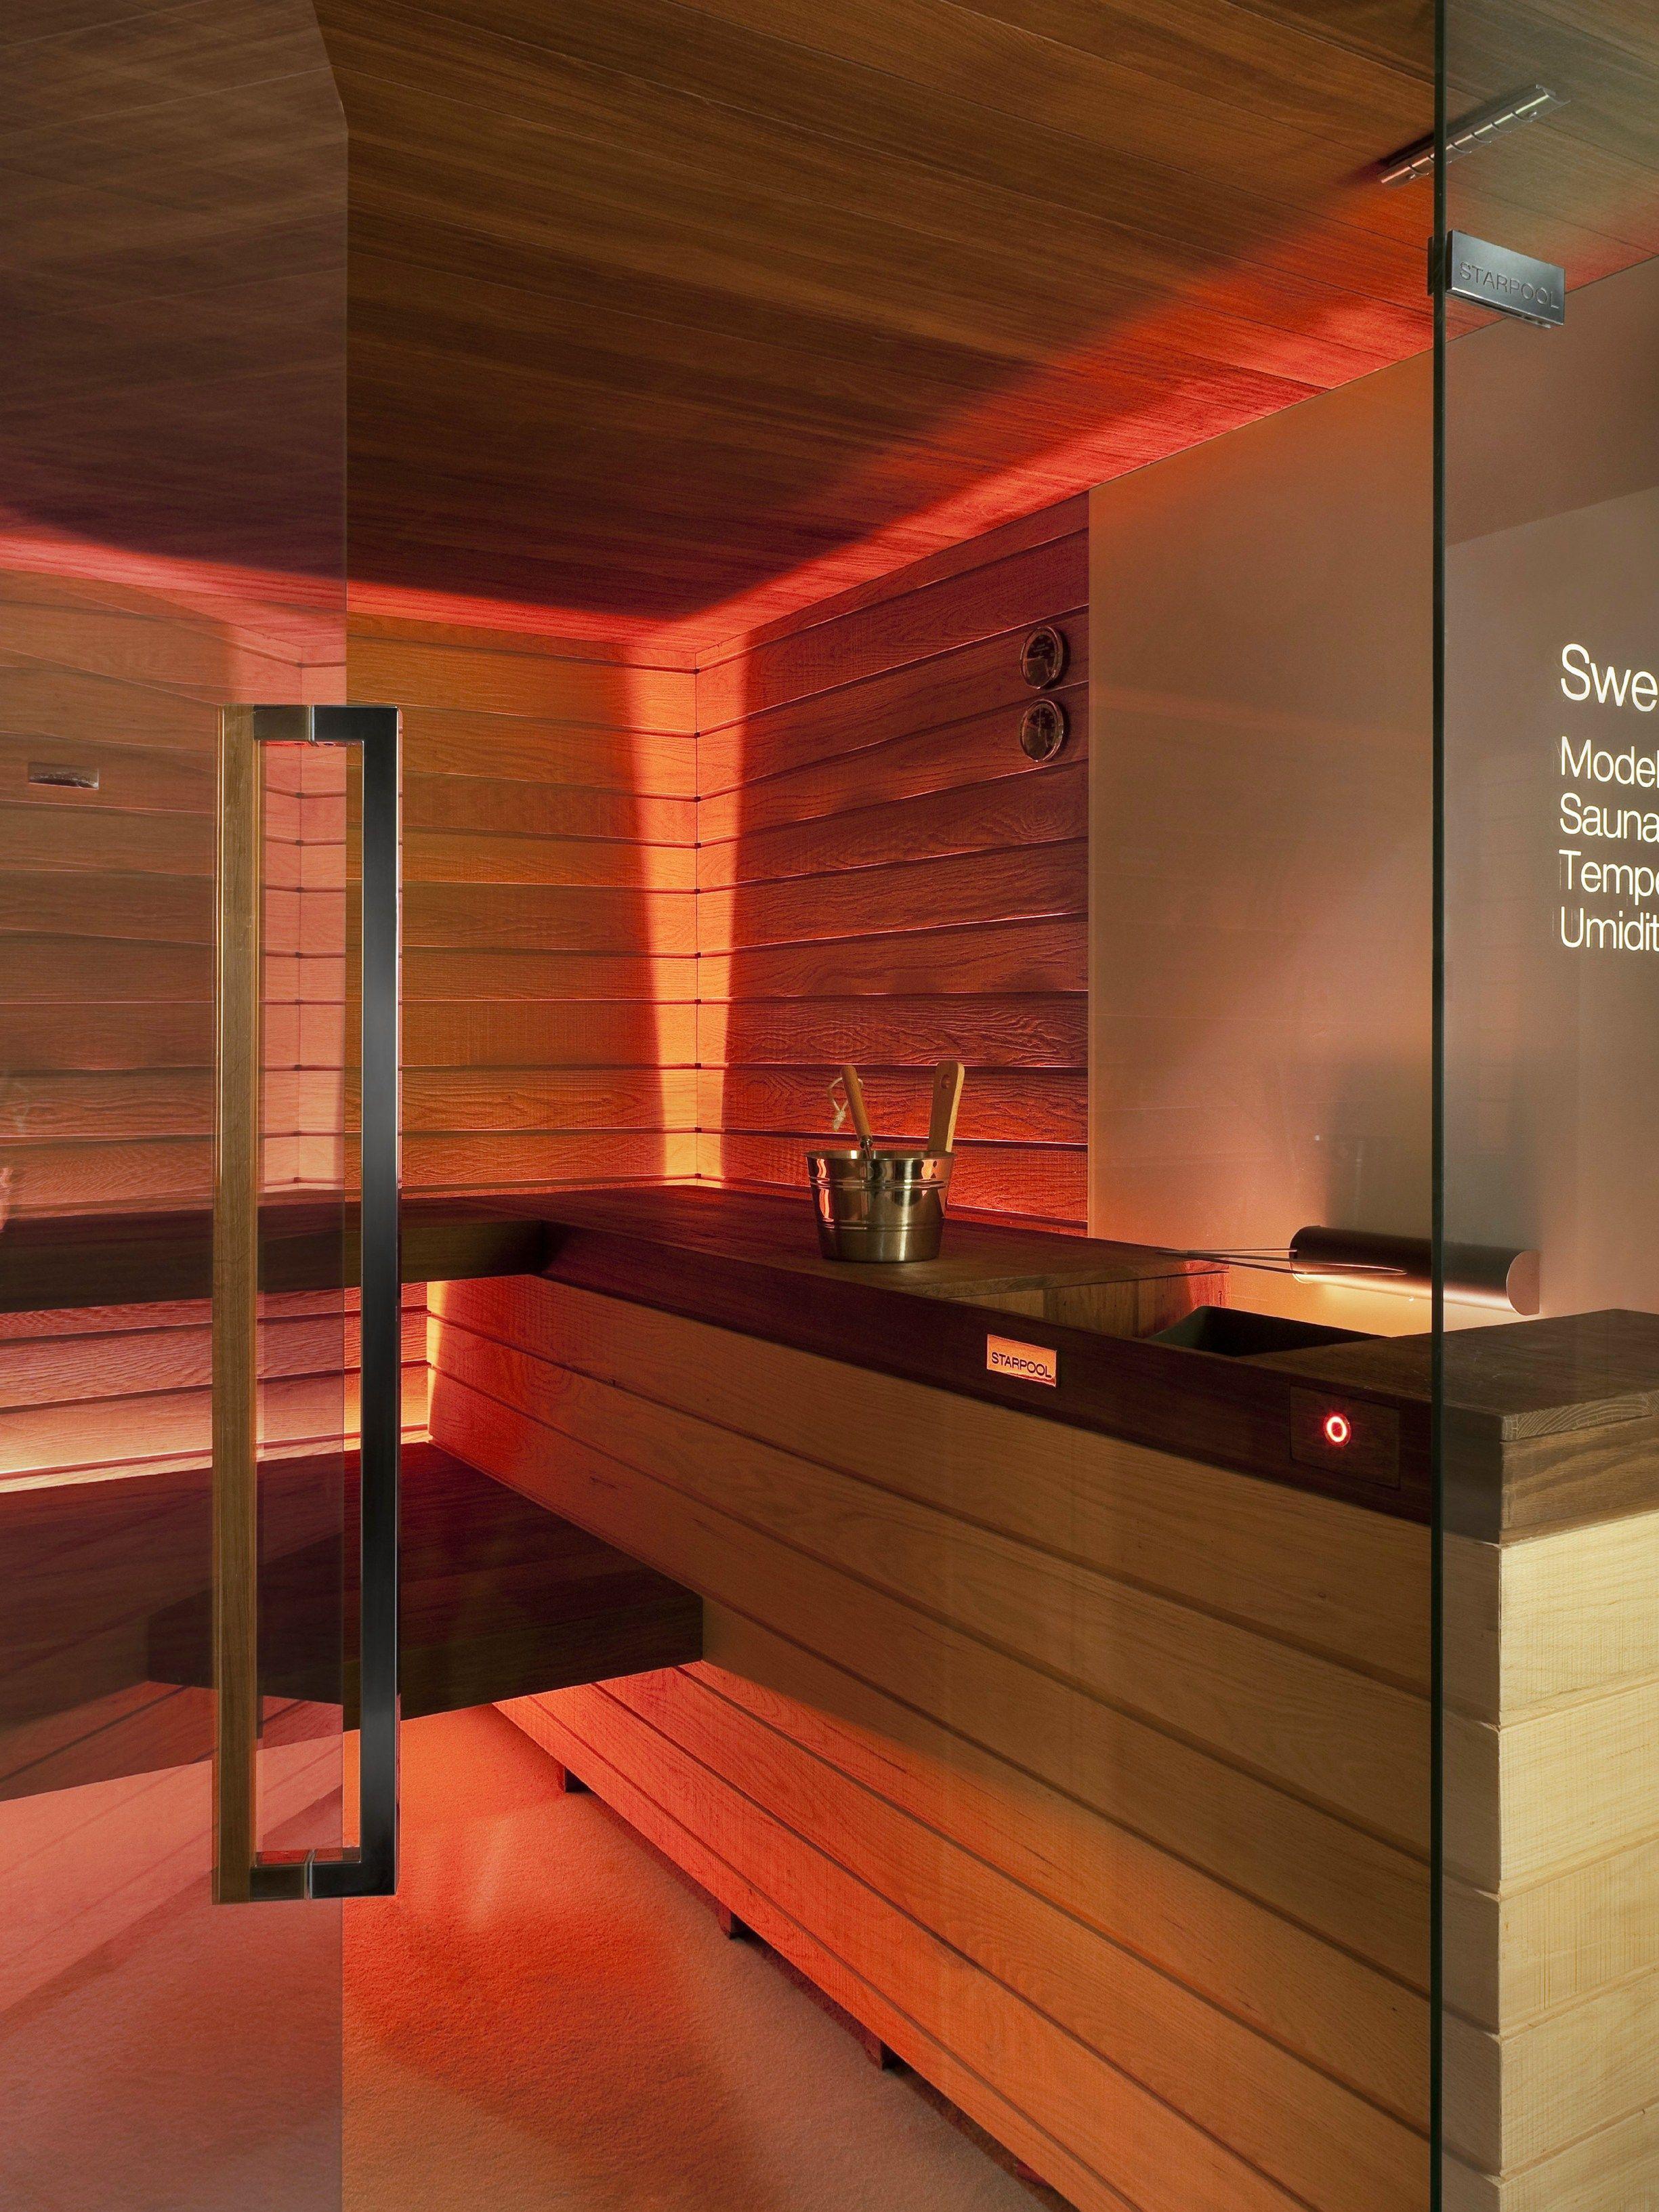 Ducha Con Baño Turco:Baño turco para cromoterapia con ducha SWEET SAUNA PRO VISION by